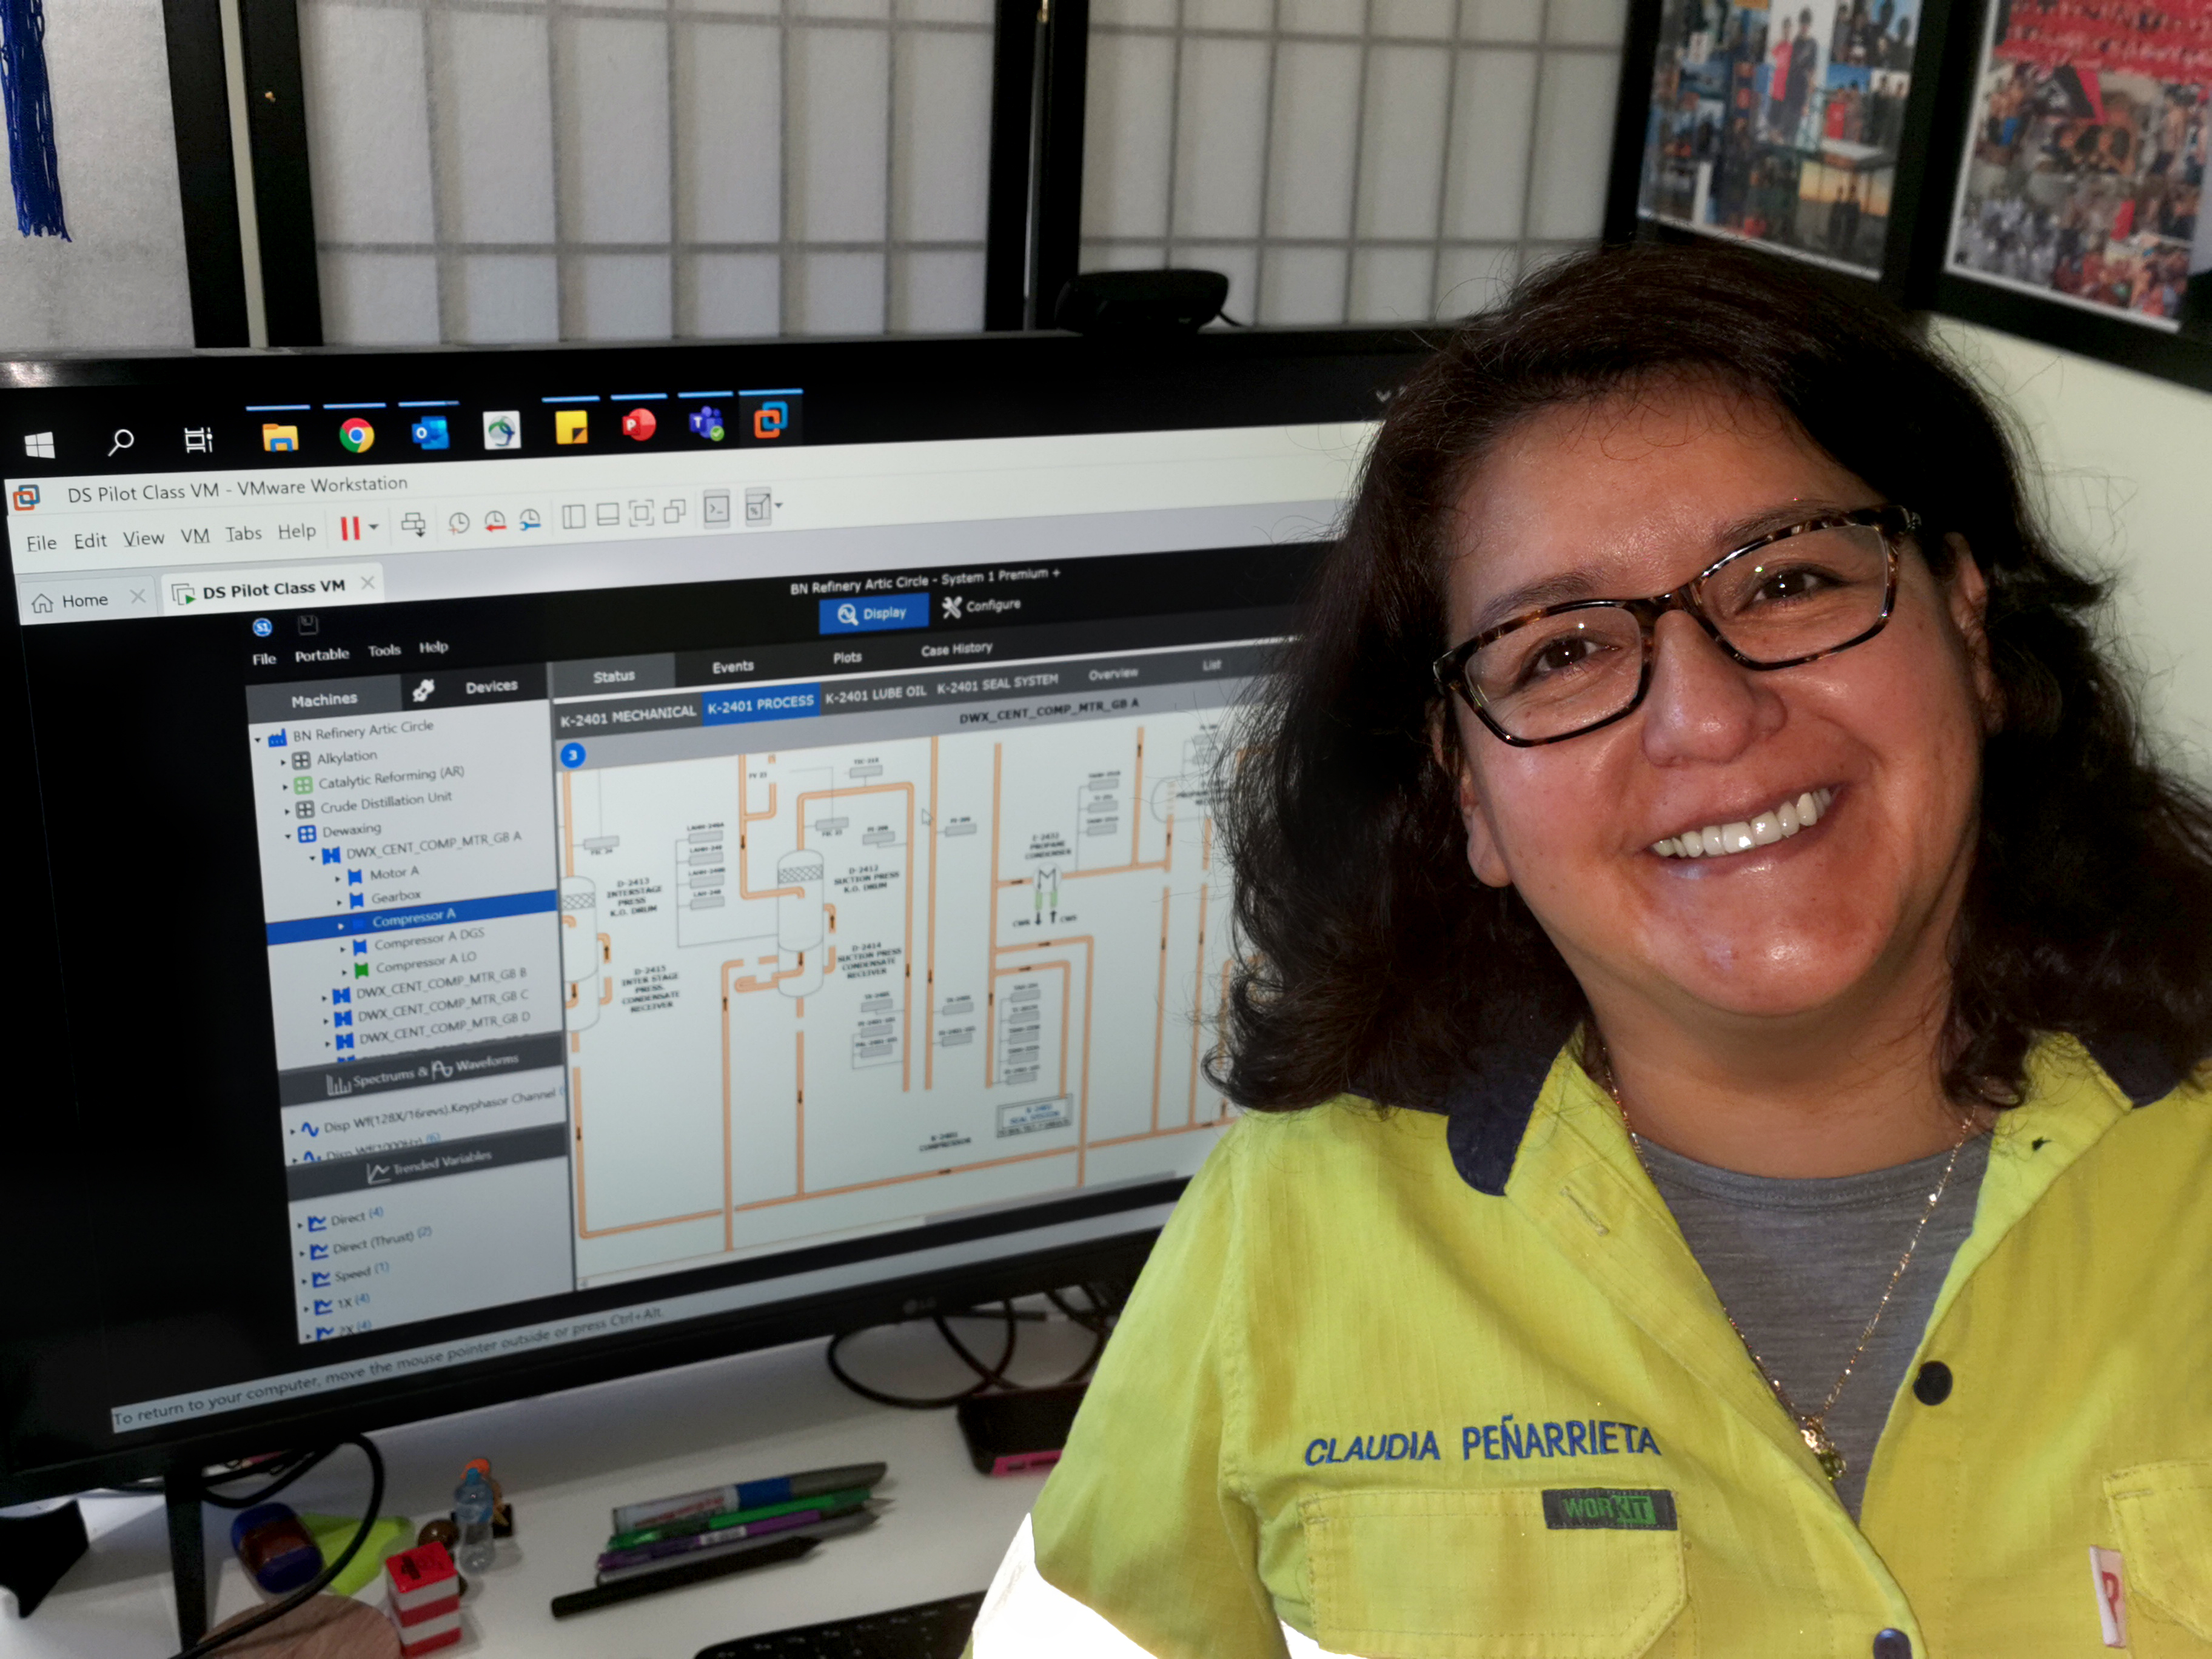 EF_Claudia at work_New